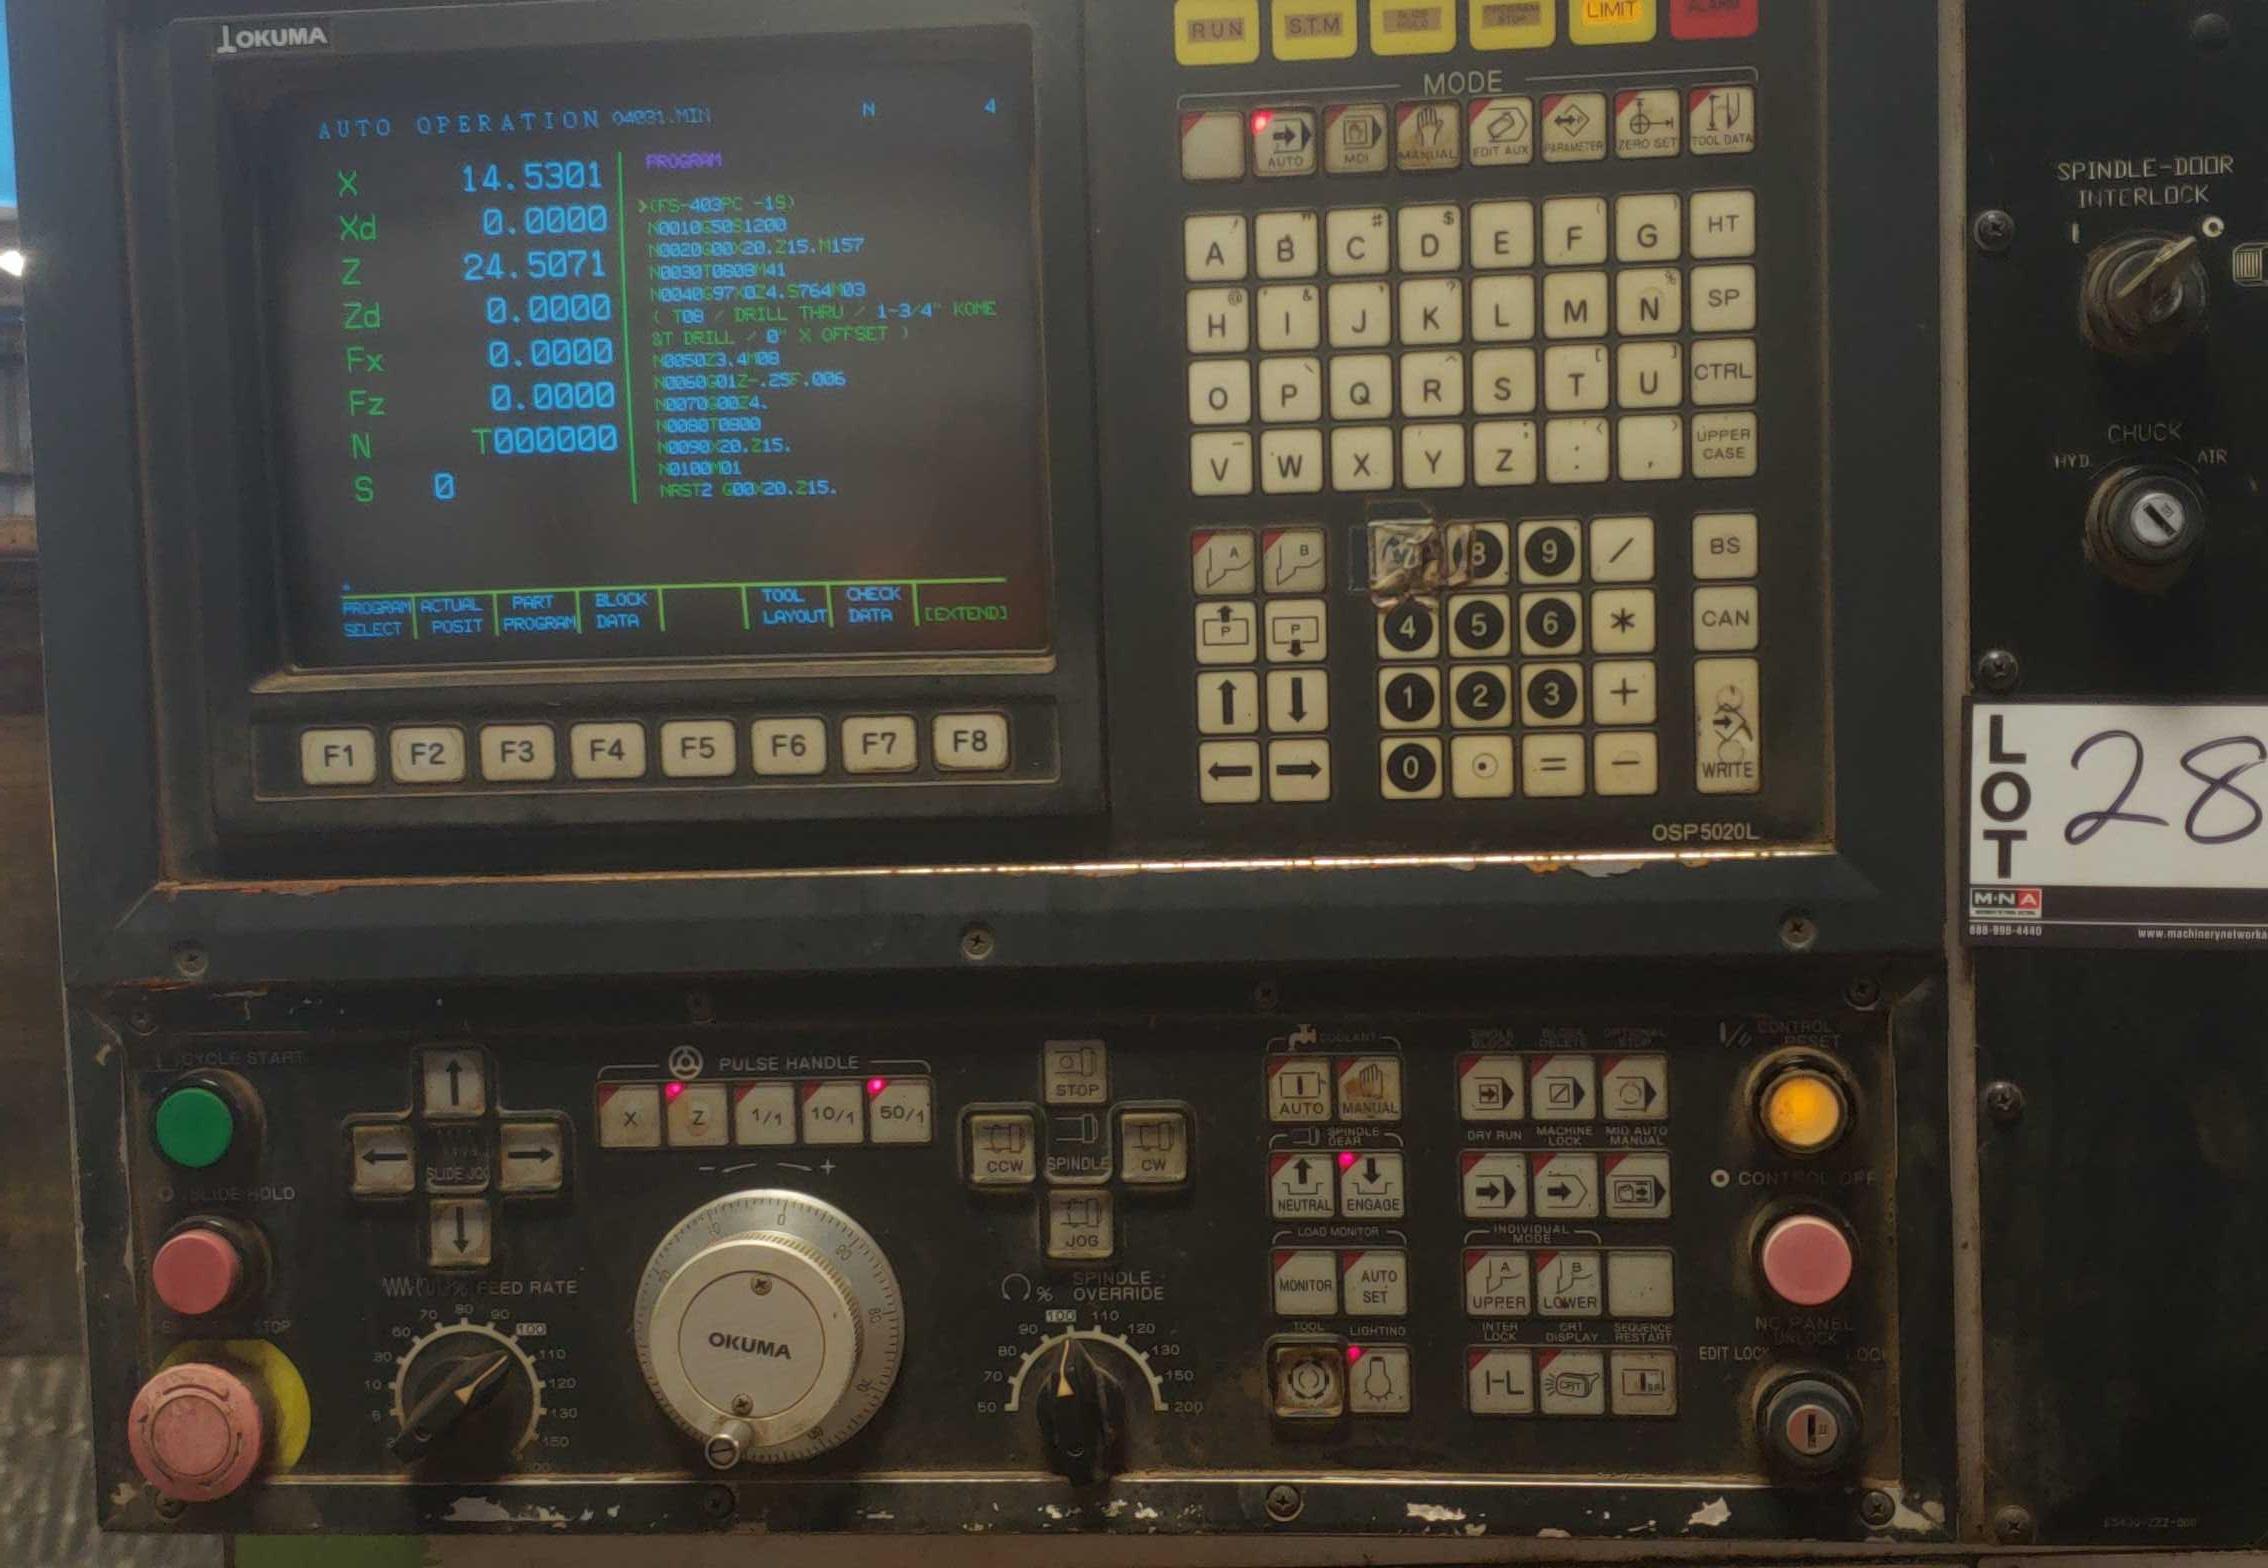 "Okuma LB 25 2 Axis CNC lathe, 5020 control, chip conveyor, 10"" chuck SN: 07049681 - Image 3 of 4"